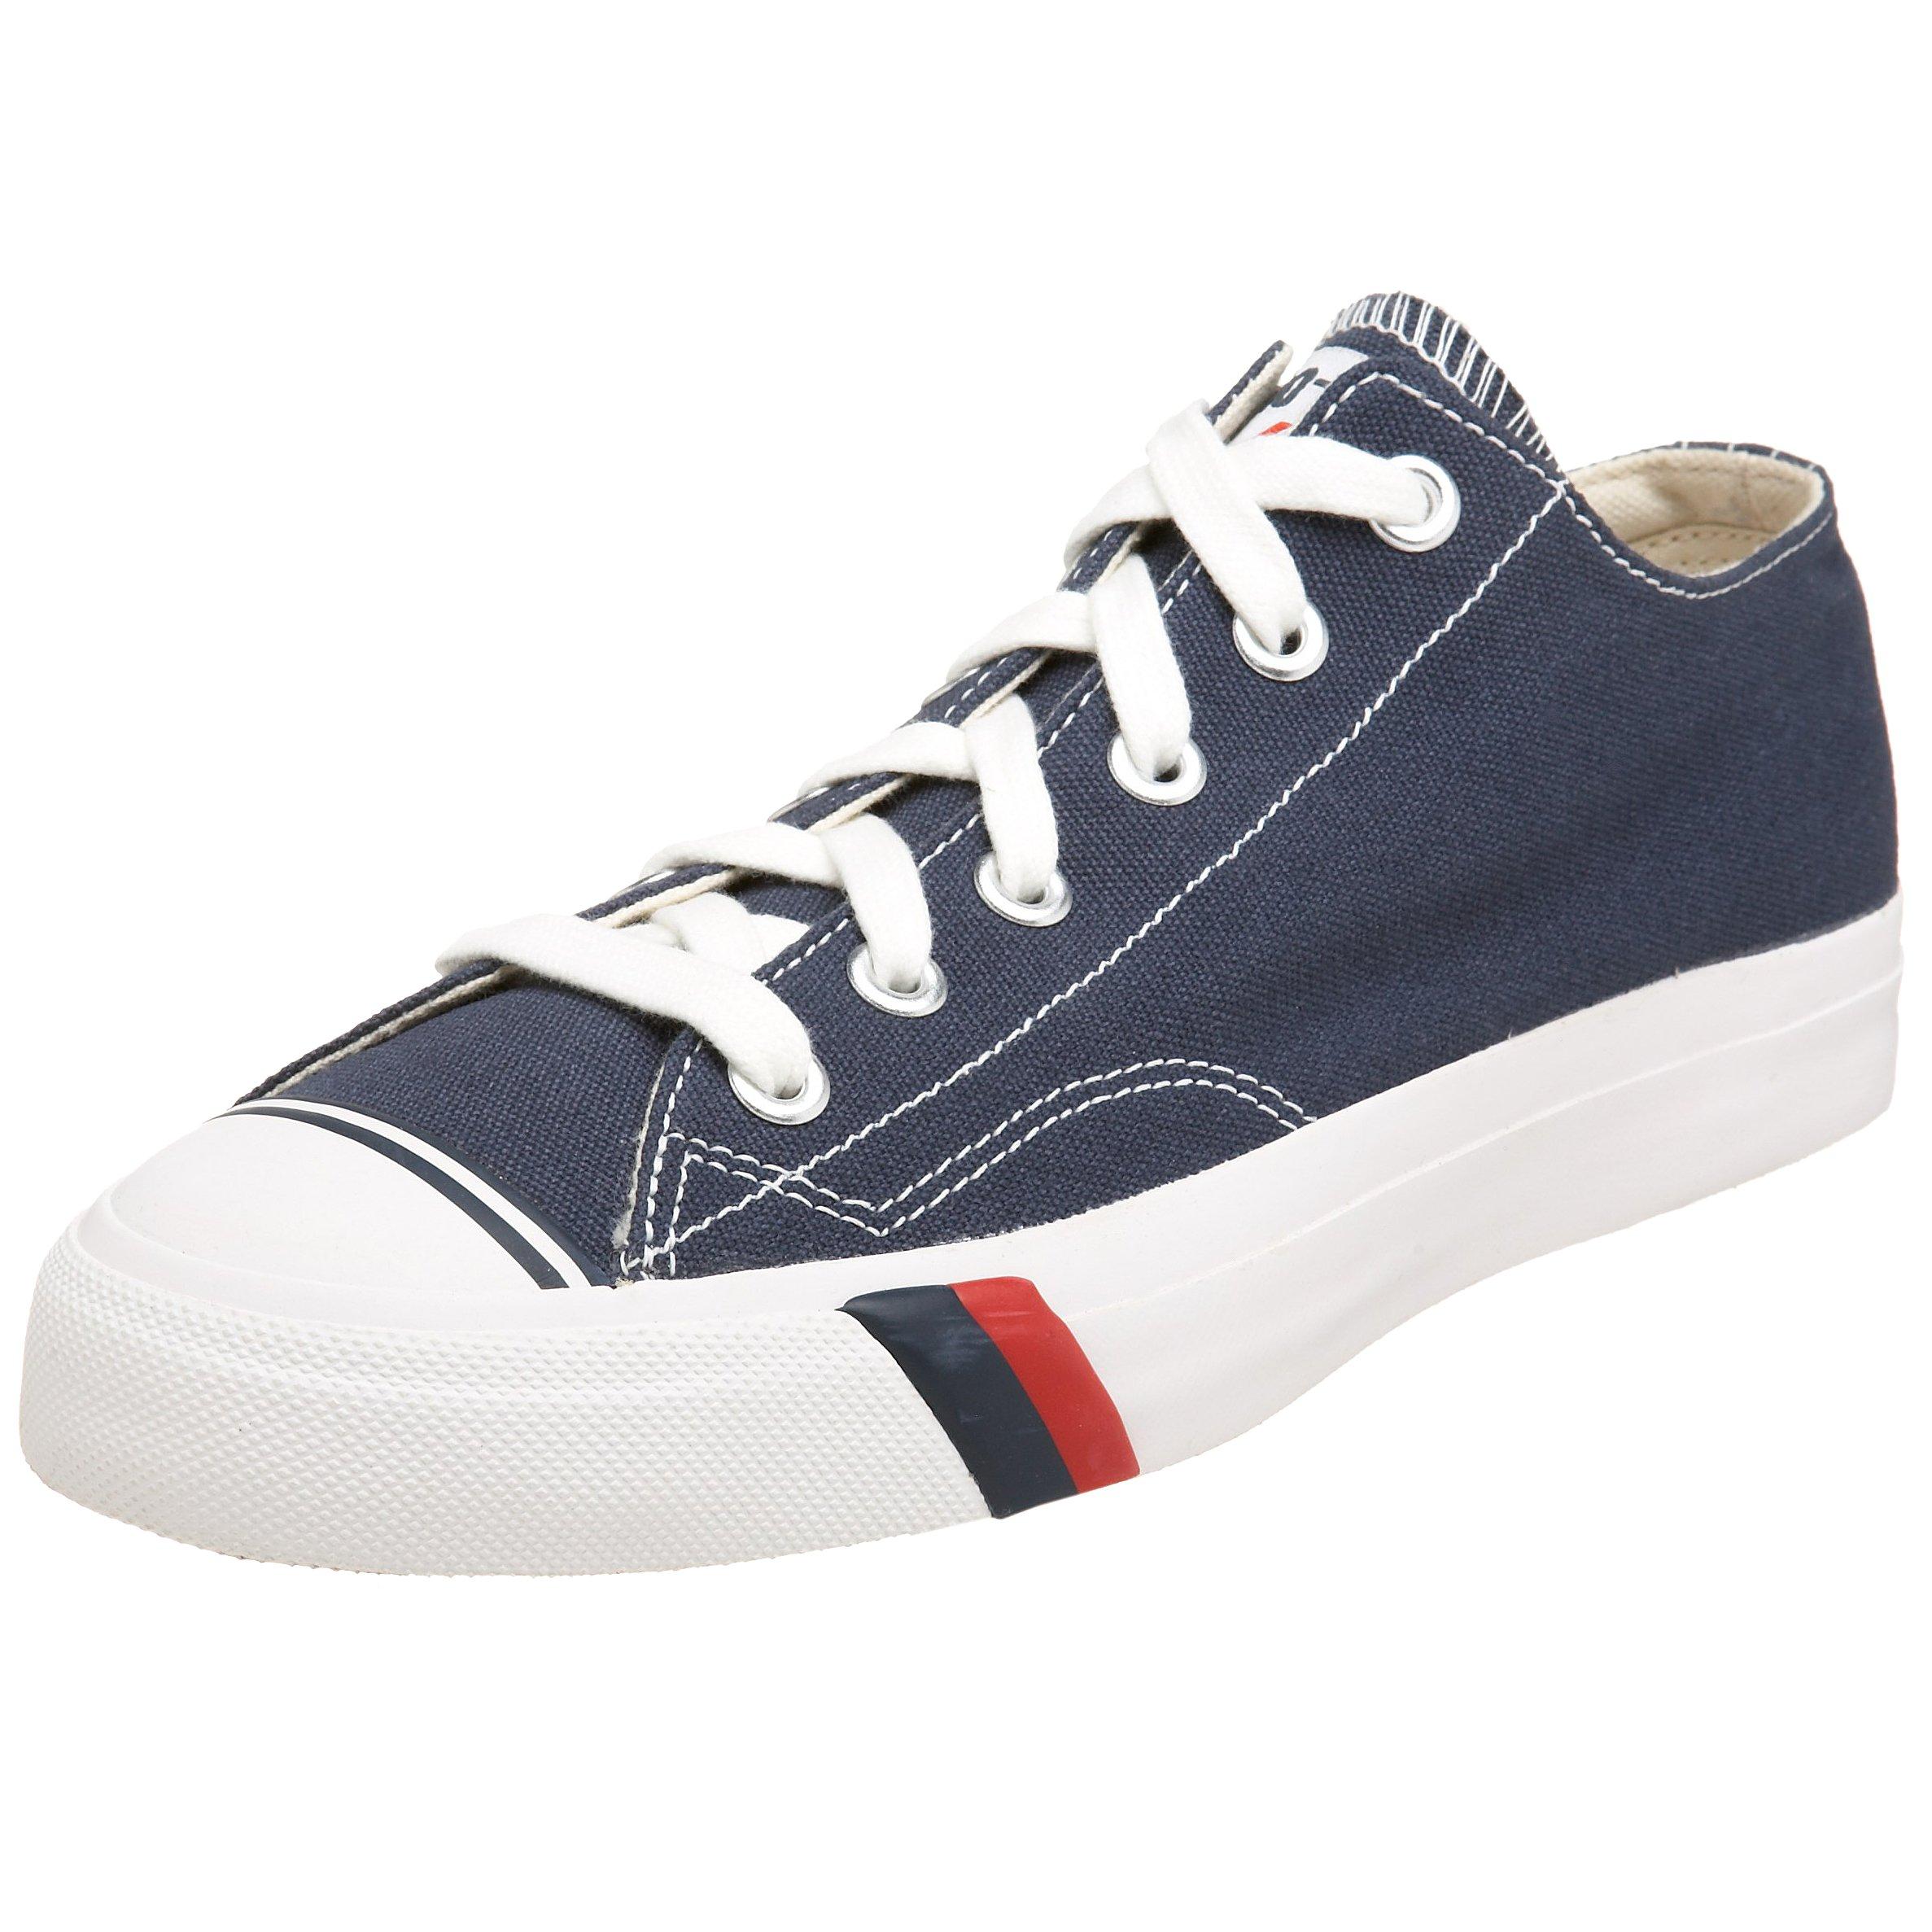 Pro-Keds Royal Lo Canvas Sneaker, Navy/White, 7 B(M) US Women/5.5 D(M) US Men by PRO-Keds